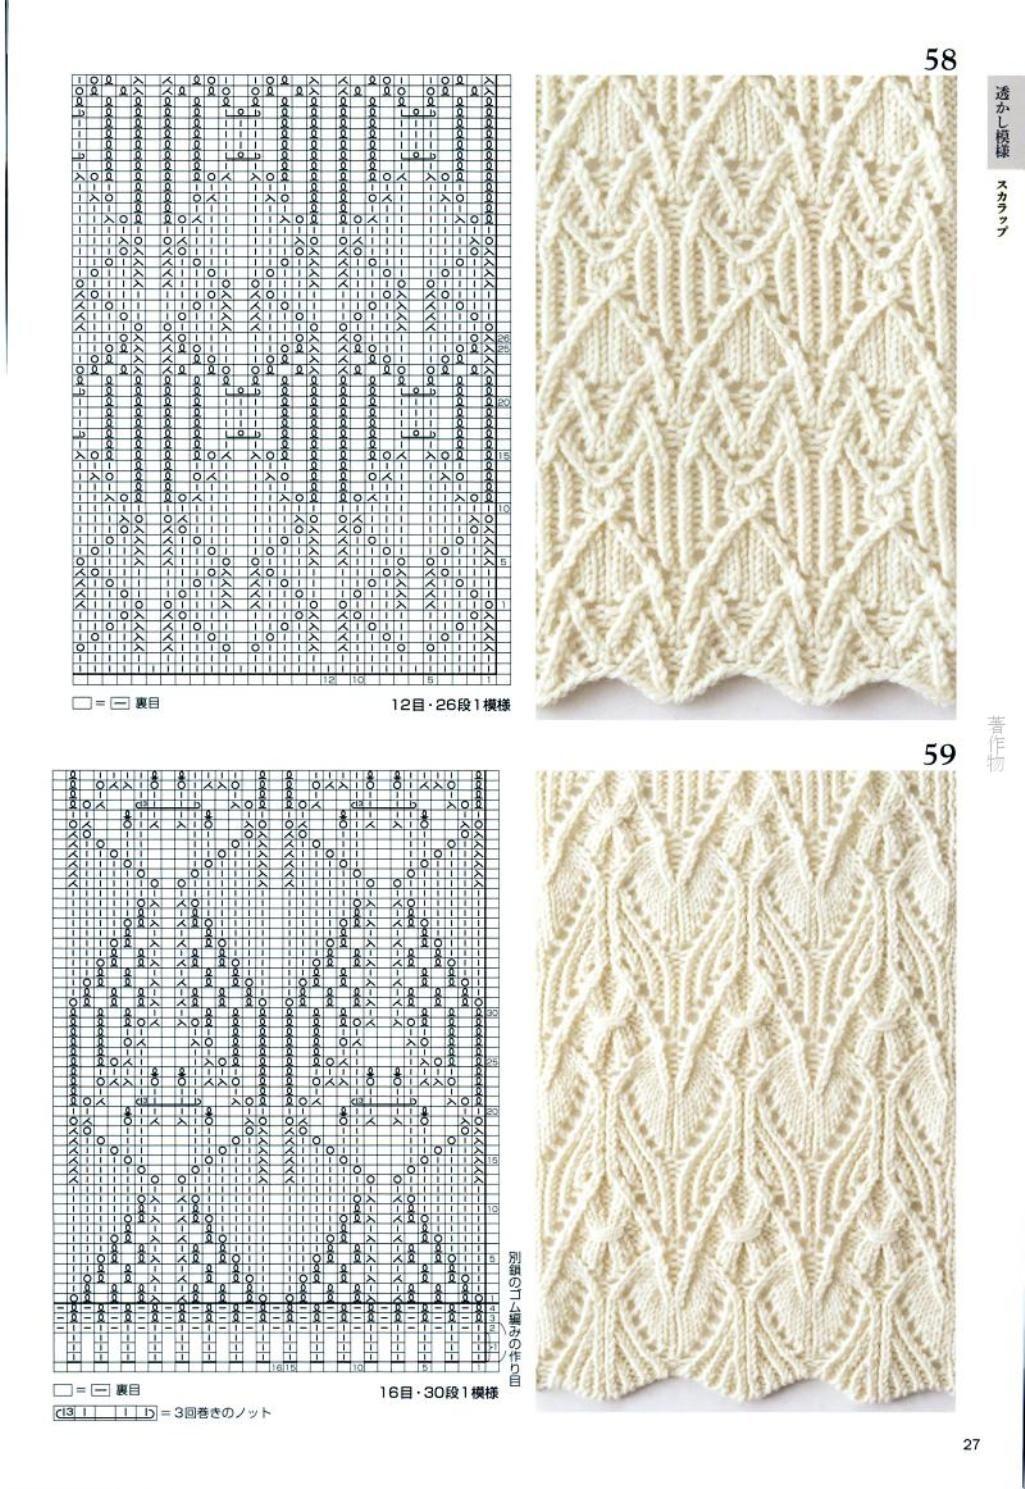 Pin de Carolina Escorcia en Crochet | Pinterest | Patrones japoneses ...